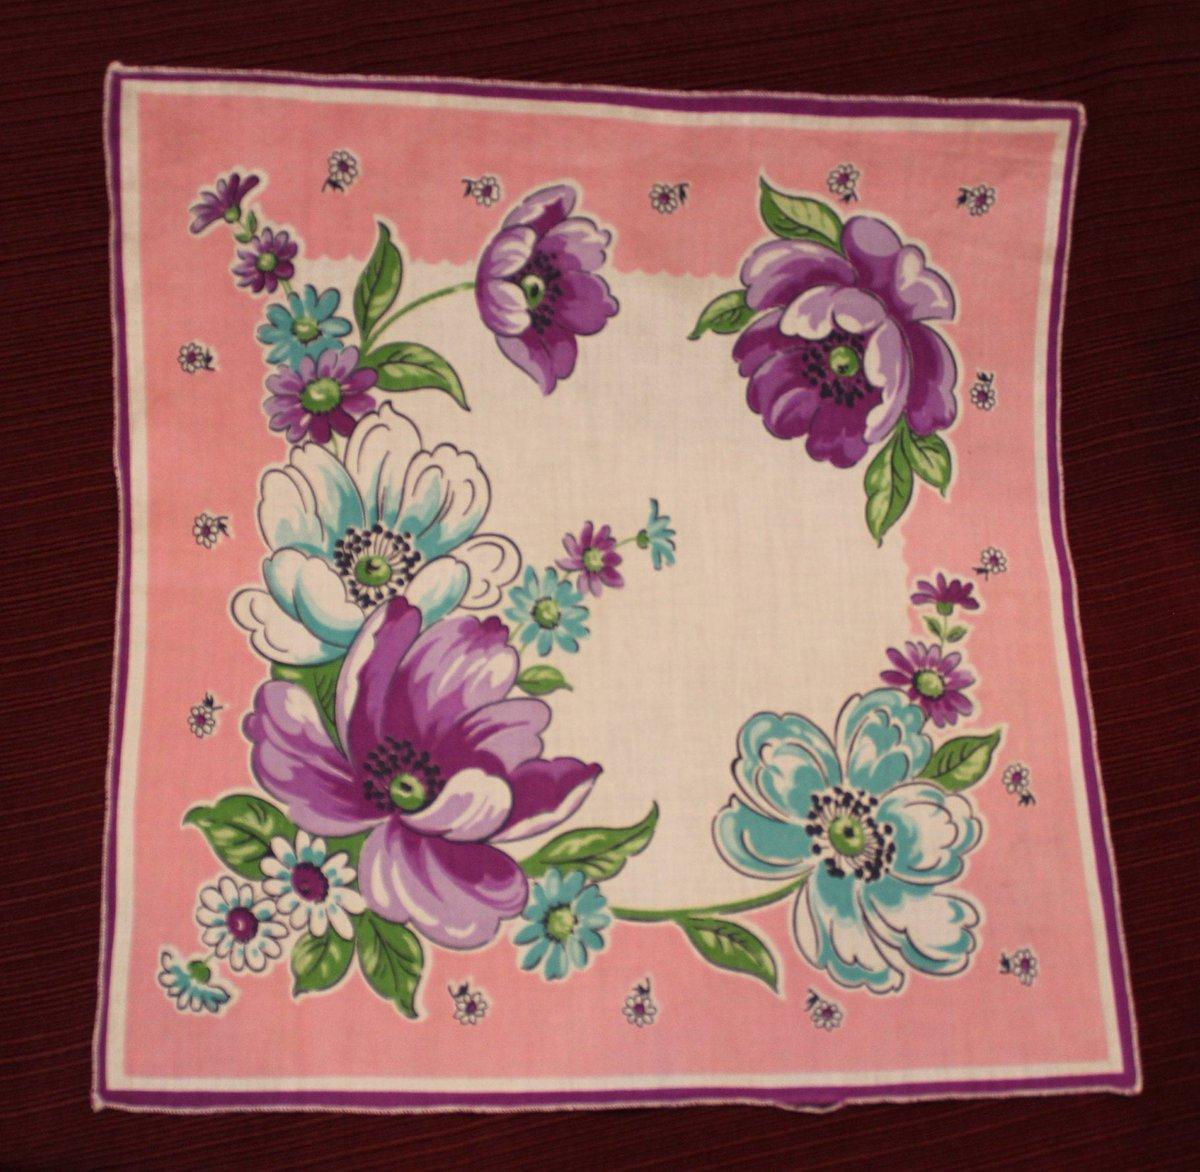 Hankie, Vintage, Handkerchief, Flowers, Floral, Pink, Purple, Blue, White, Mid Century, 1940s Style, Sewn Edge, Cotton, Hankie, Retro http://tuppu.net/249db658 #ImagineQuiltsAndMore #Etsy #1940sStylepic.twitter.com/sC1mvPtU8p